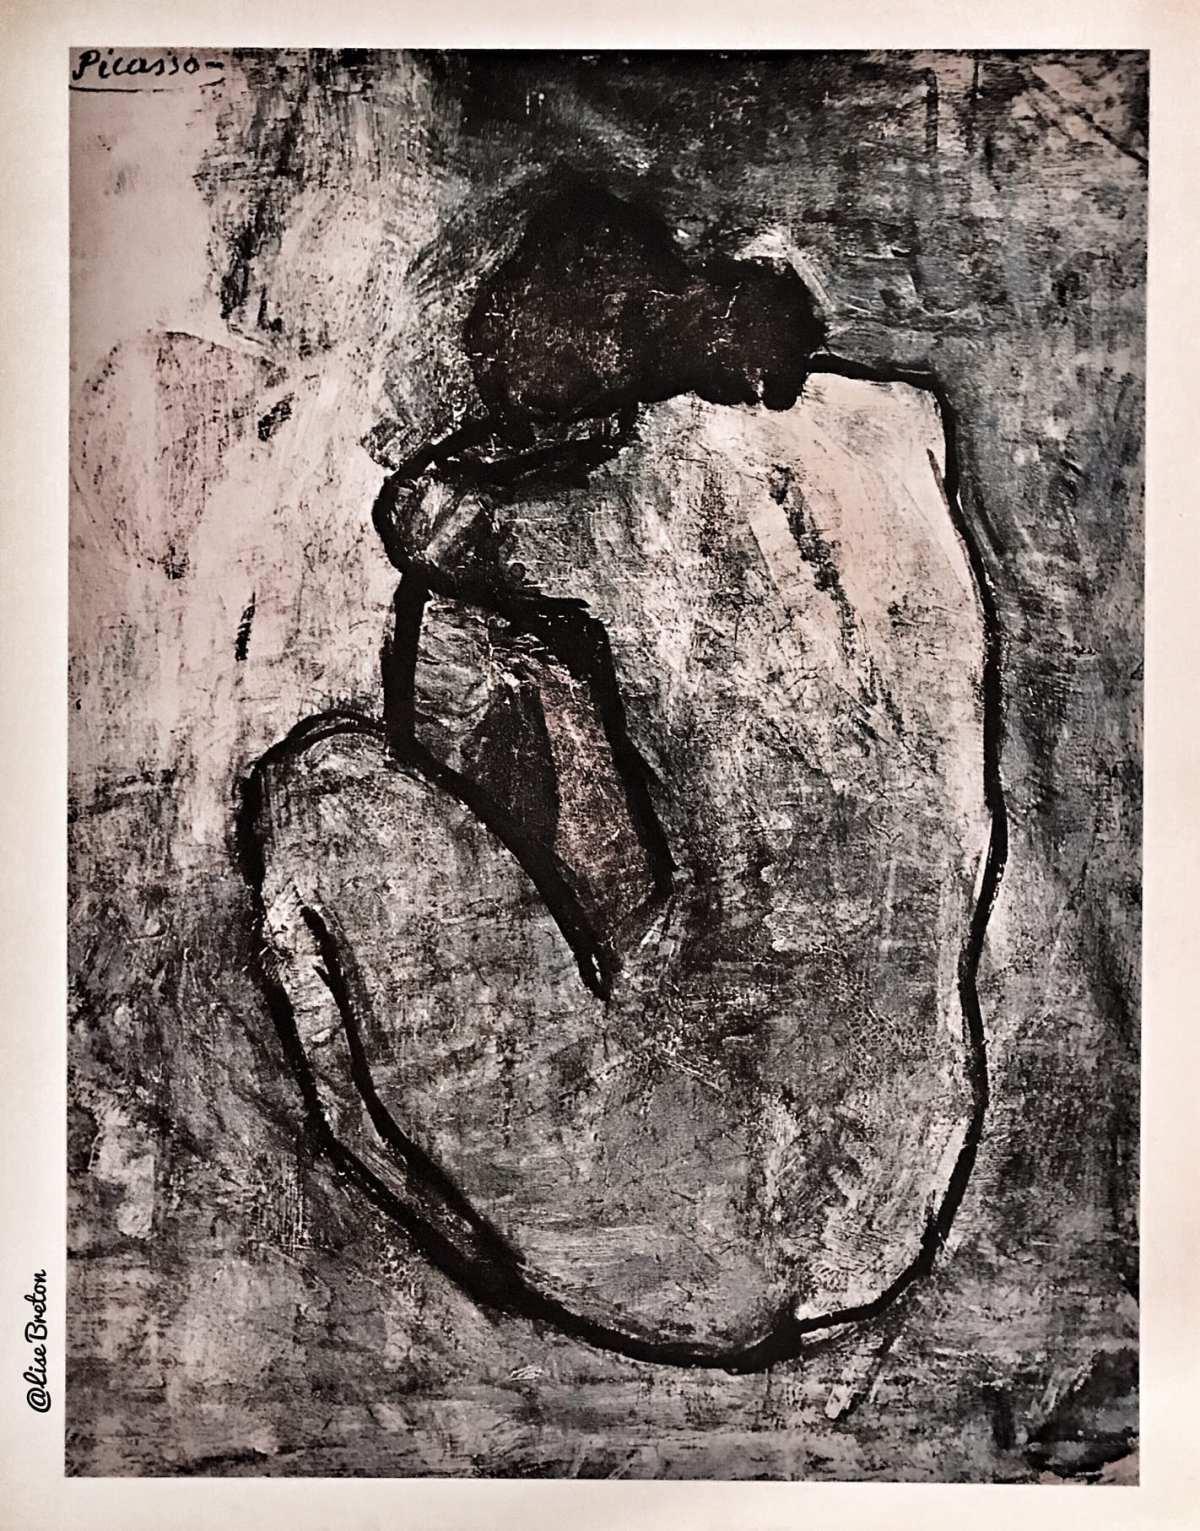 Oeuvre de Picasso Photo @Lise Breton